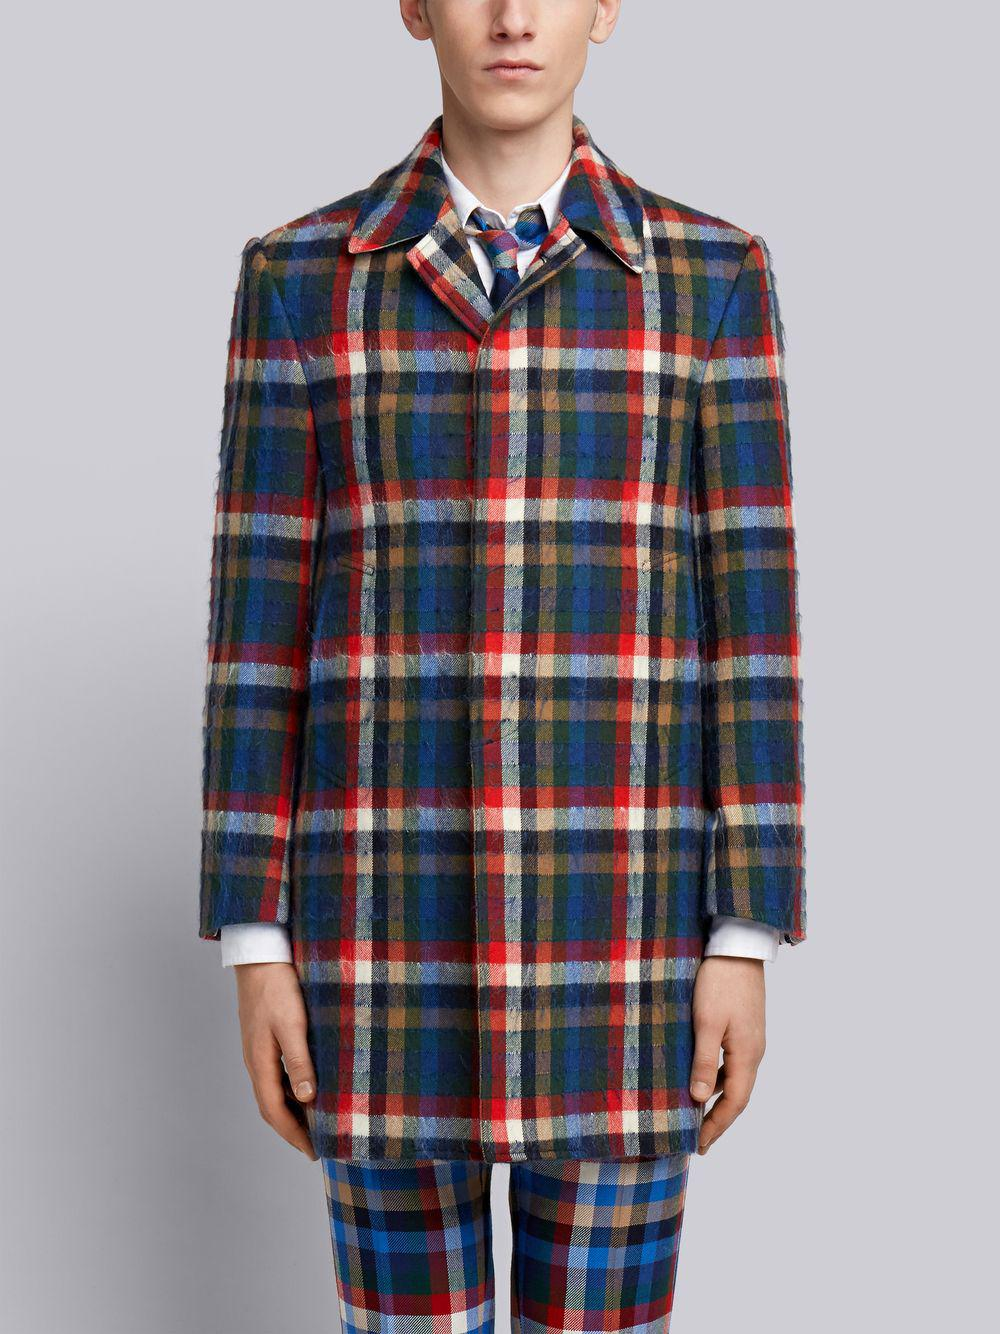 Thom Browne Gingham Tartan Classic Bal Collar Hair Mohair Overcoat - Multicolour